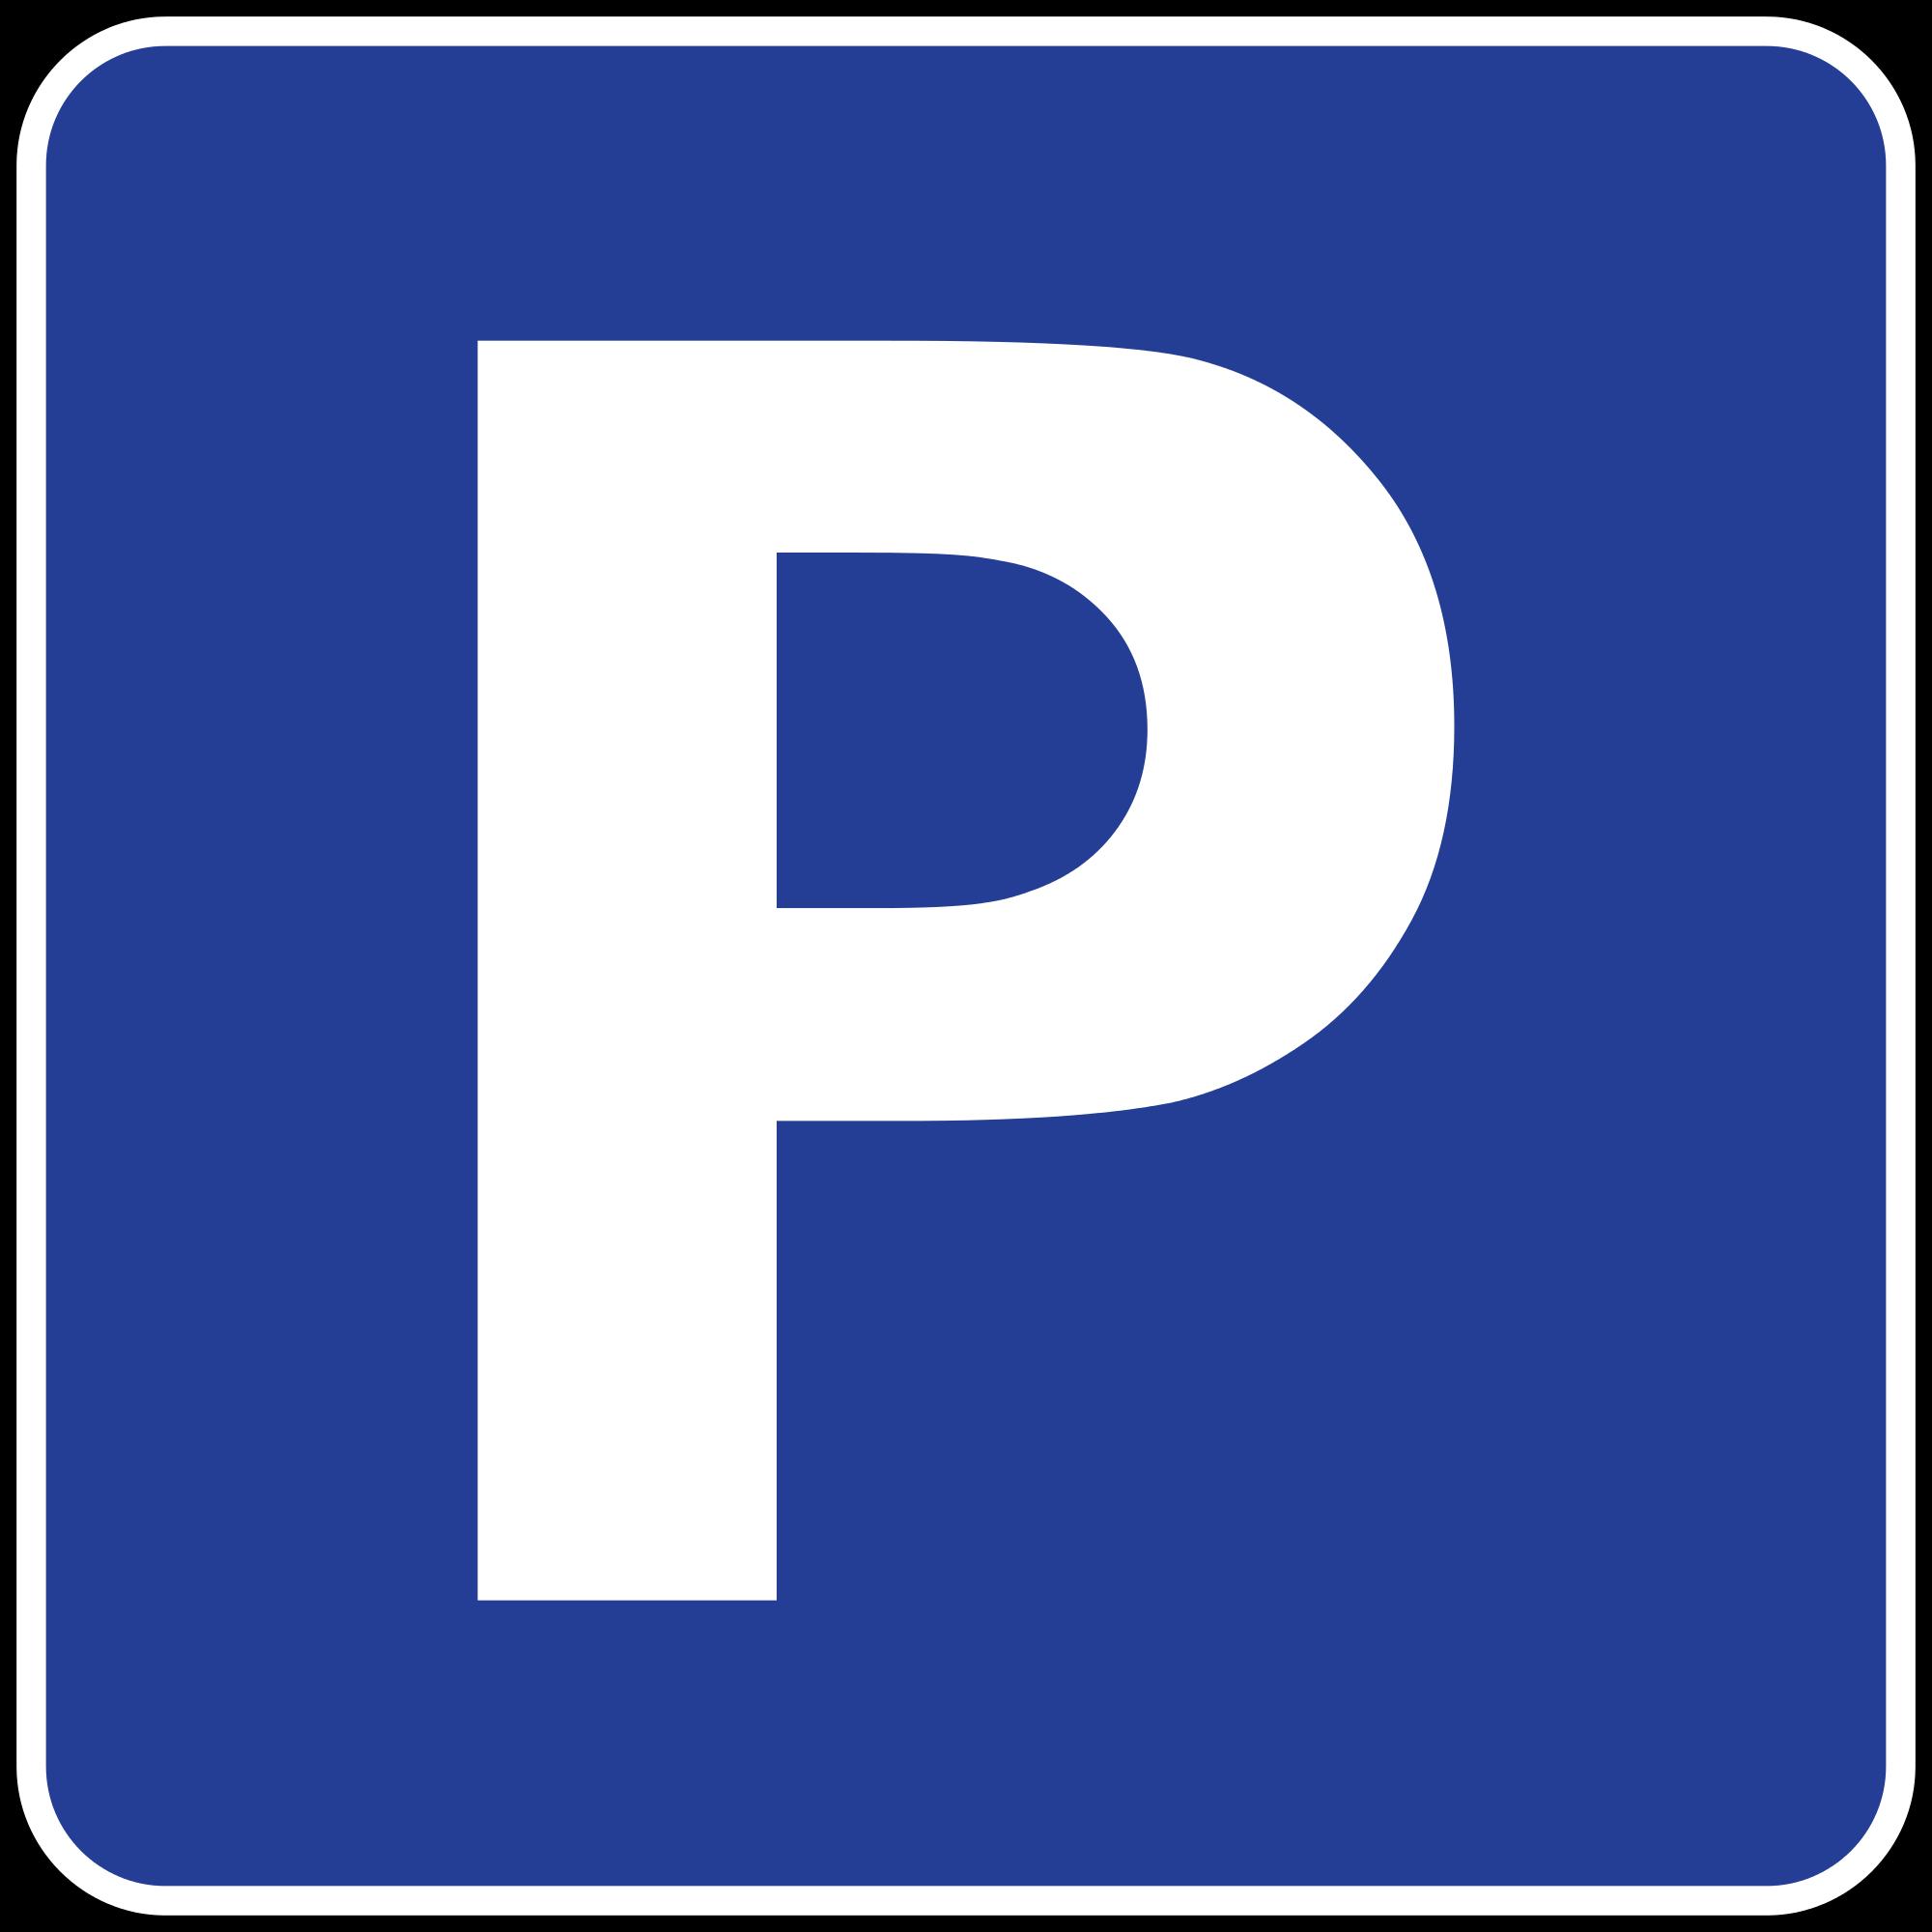 CASA House Parking Reminder